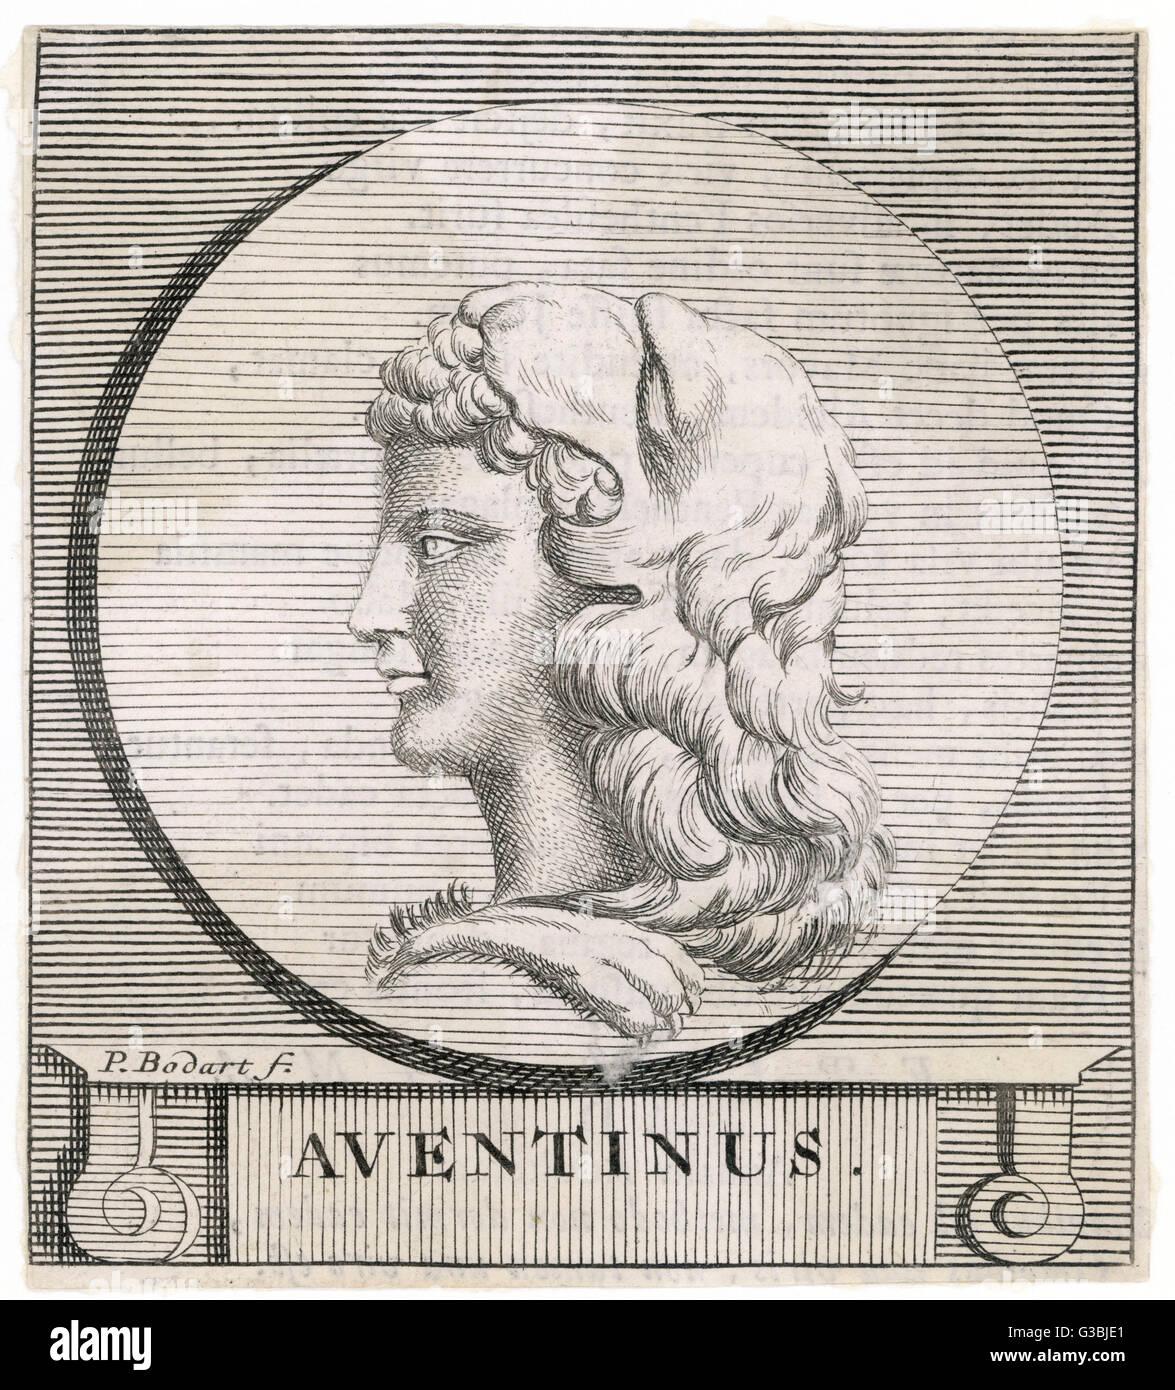 d8e2b06f732 AVENTINUS SILVIUS 12e roi d Alba Longa. Ce royaume a précédé l arrivée